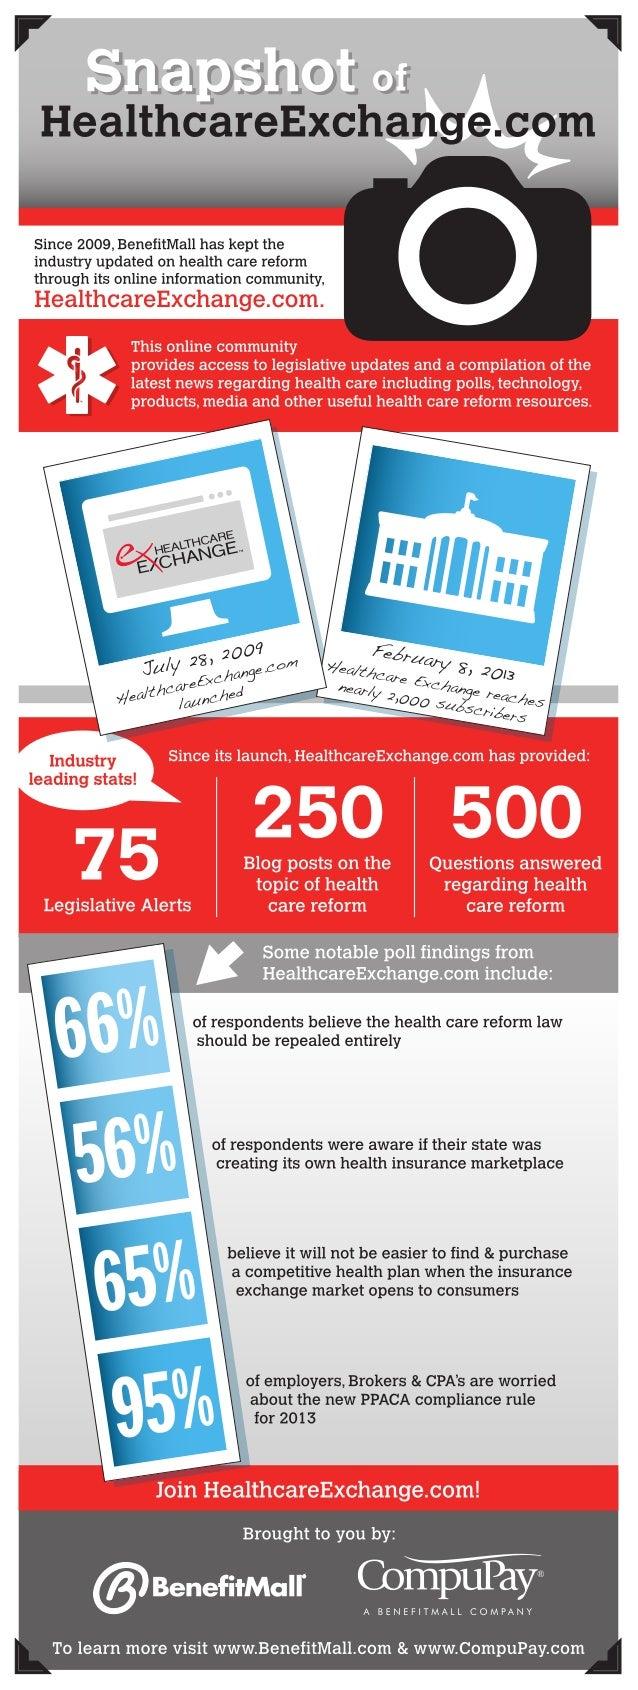 HealthcareExchange.com At-a-Glance